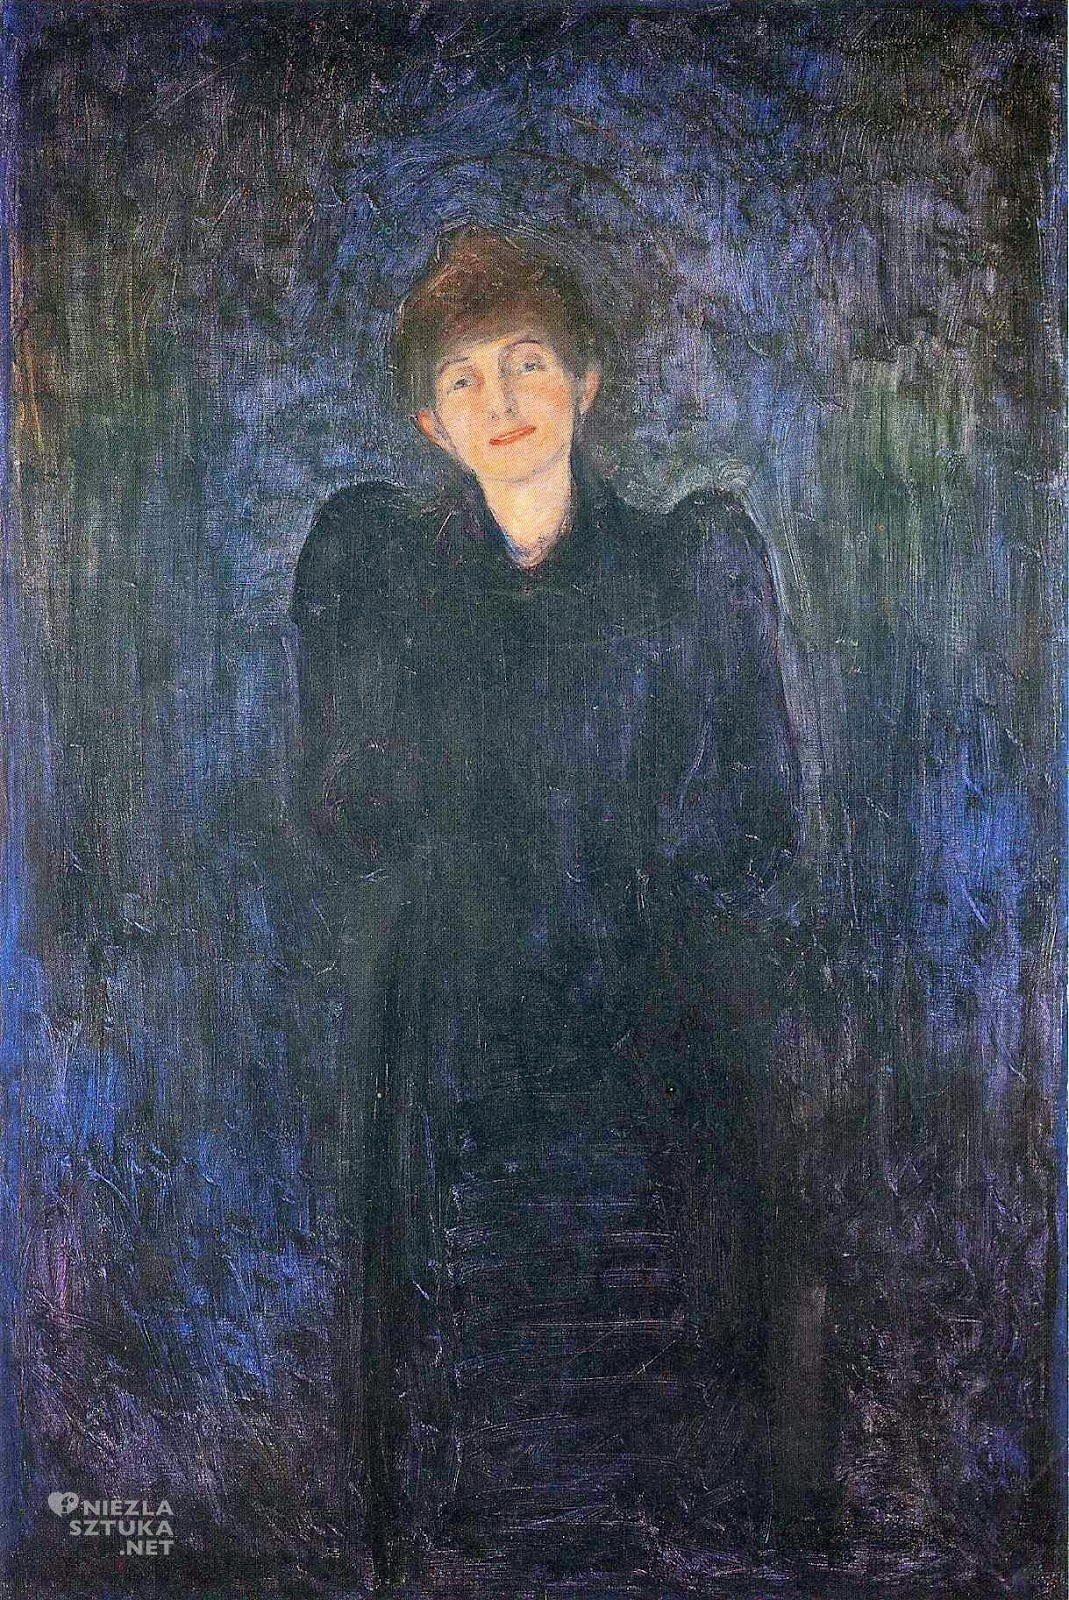 Edvard Munch Dagny Juel Przybyszewska | 1893